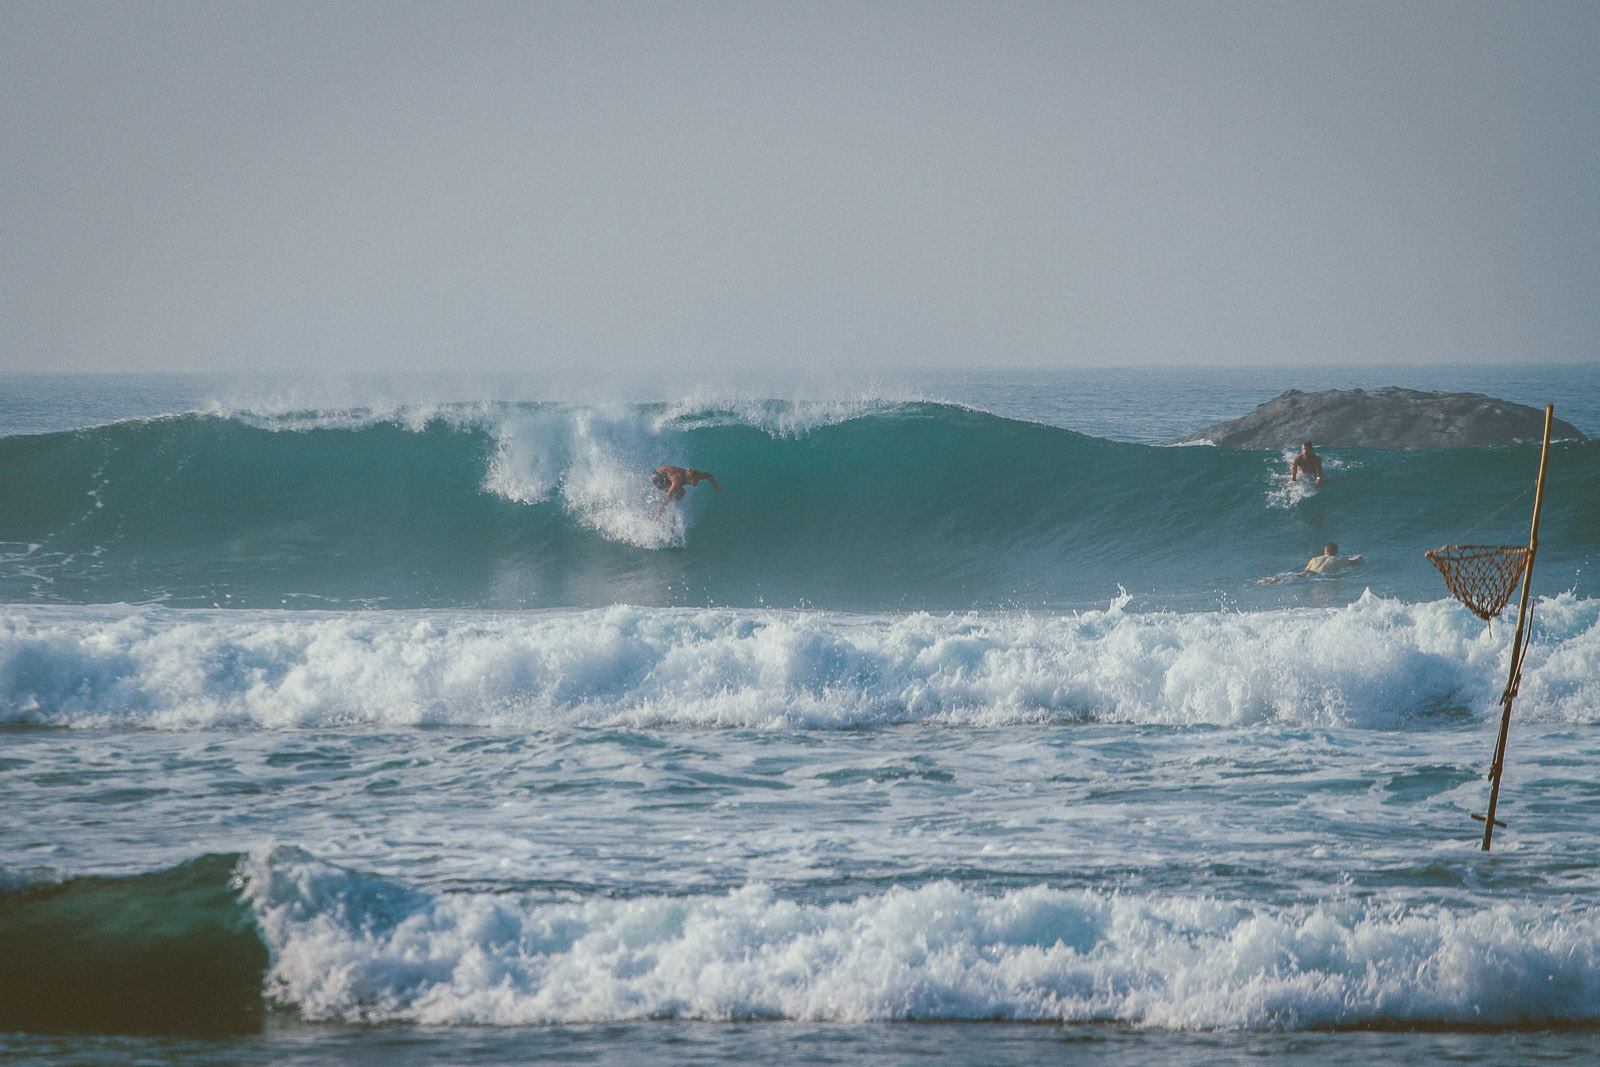 Sri Lanka-Ahangama-Kabalana-The rock-Surf-Barrel-Big swell-Midigama-Surfing-travel-blog-IMG_8861